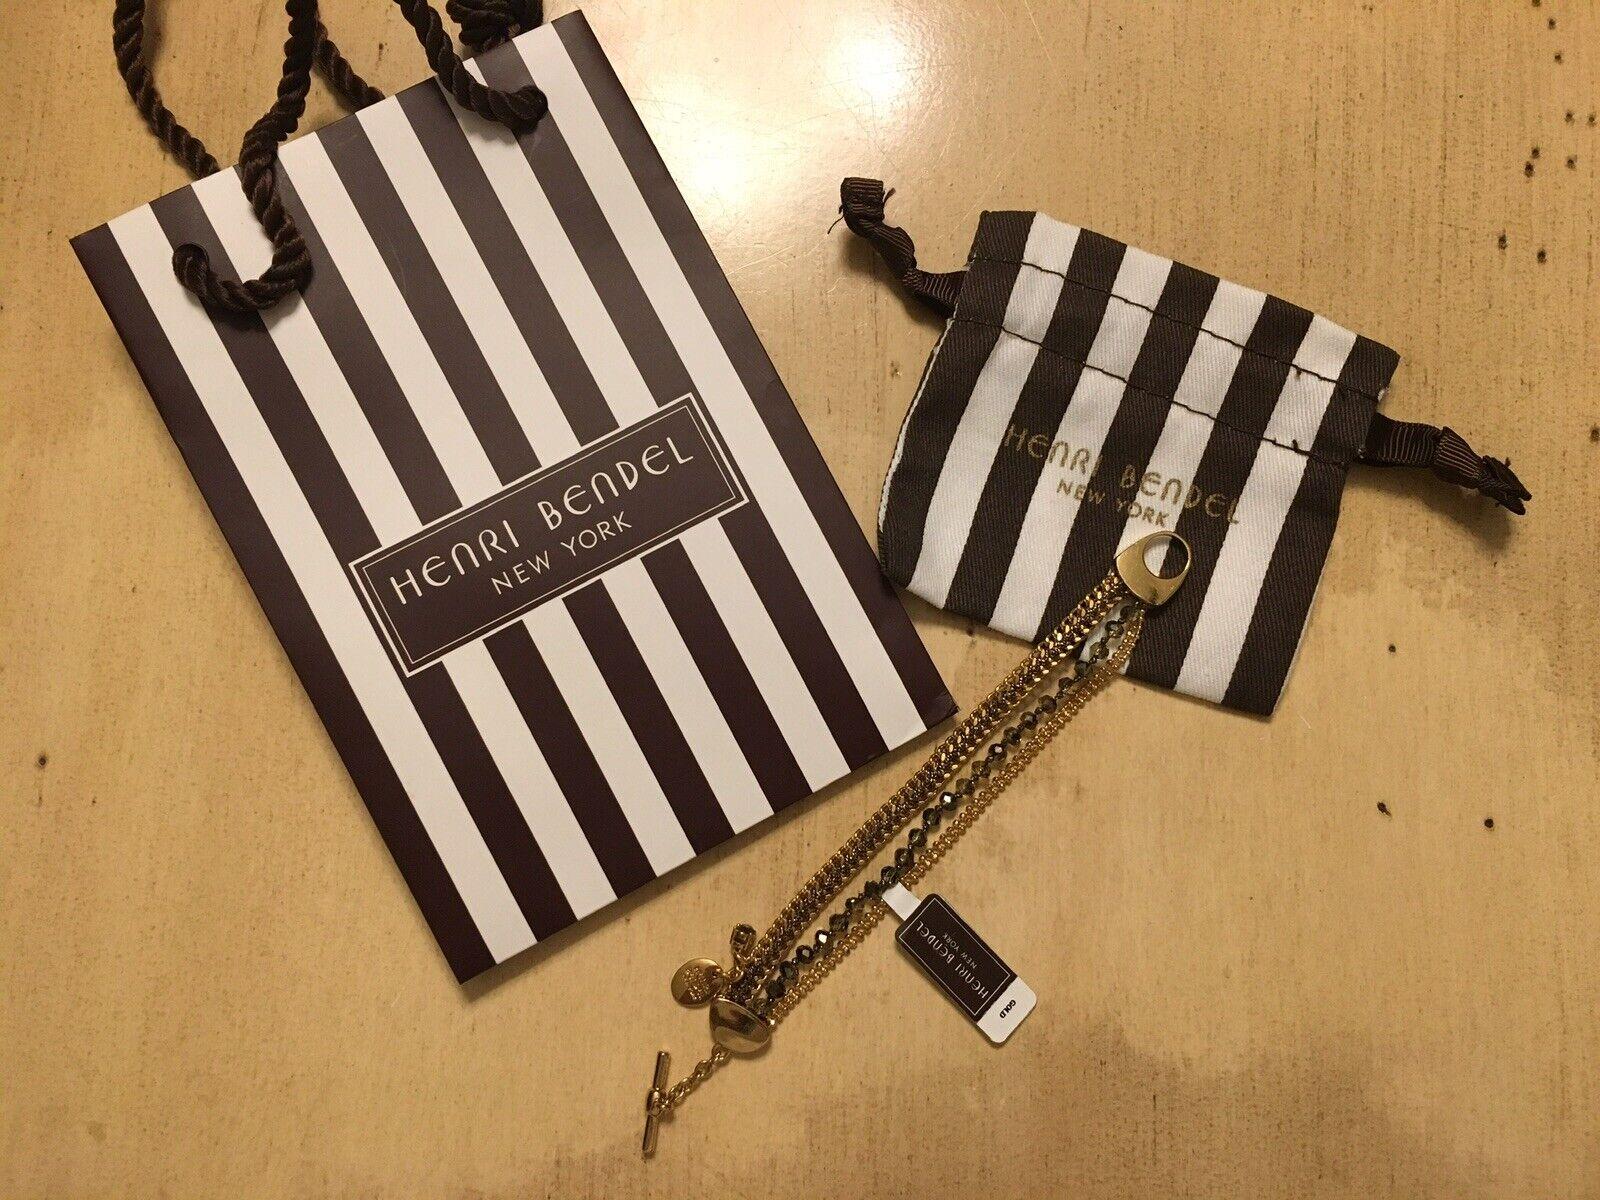 BNWT Henri Bendel St. Tropez Delicate Bracelet w  HB Dust Bag & Shopping Bag